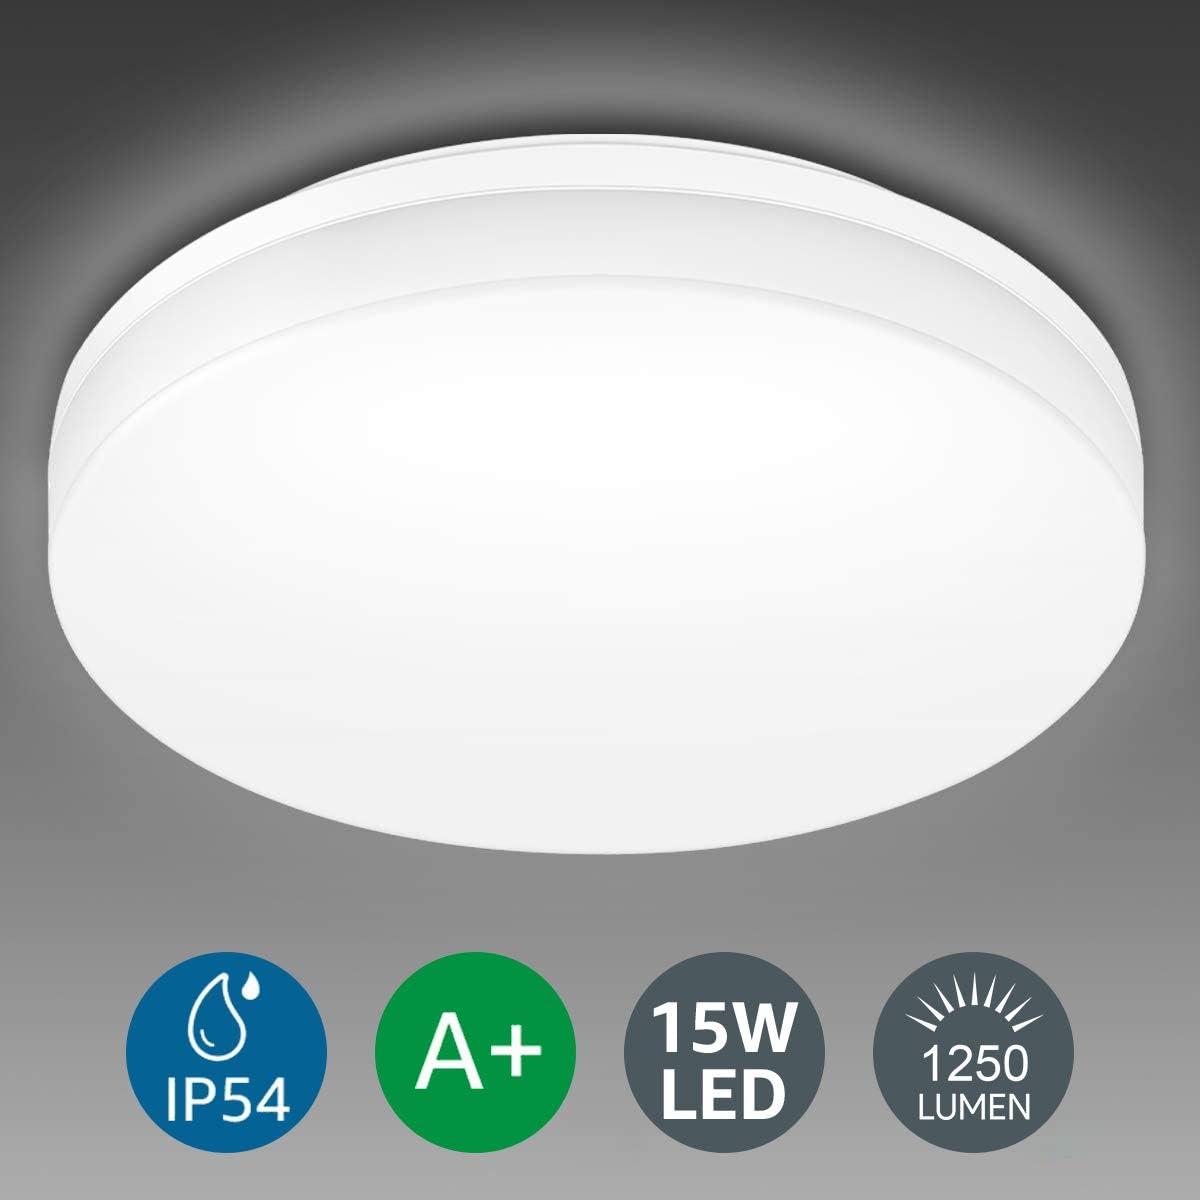 LE 15W Plafón LED Impermeable IP54 Super Brillante 1250LM 5000k Equivalente a 100W Lámpara Incandescente Lámpara LED de Techo Luz de Techo Blanco Frío Ideal para Sala de Estar, Cocina, Balcón, Baño